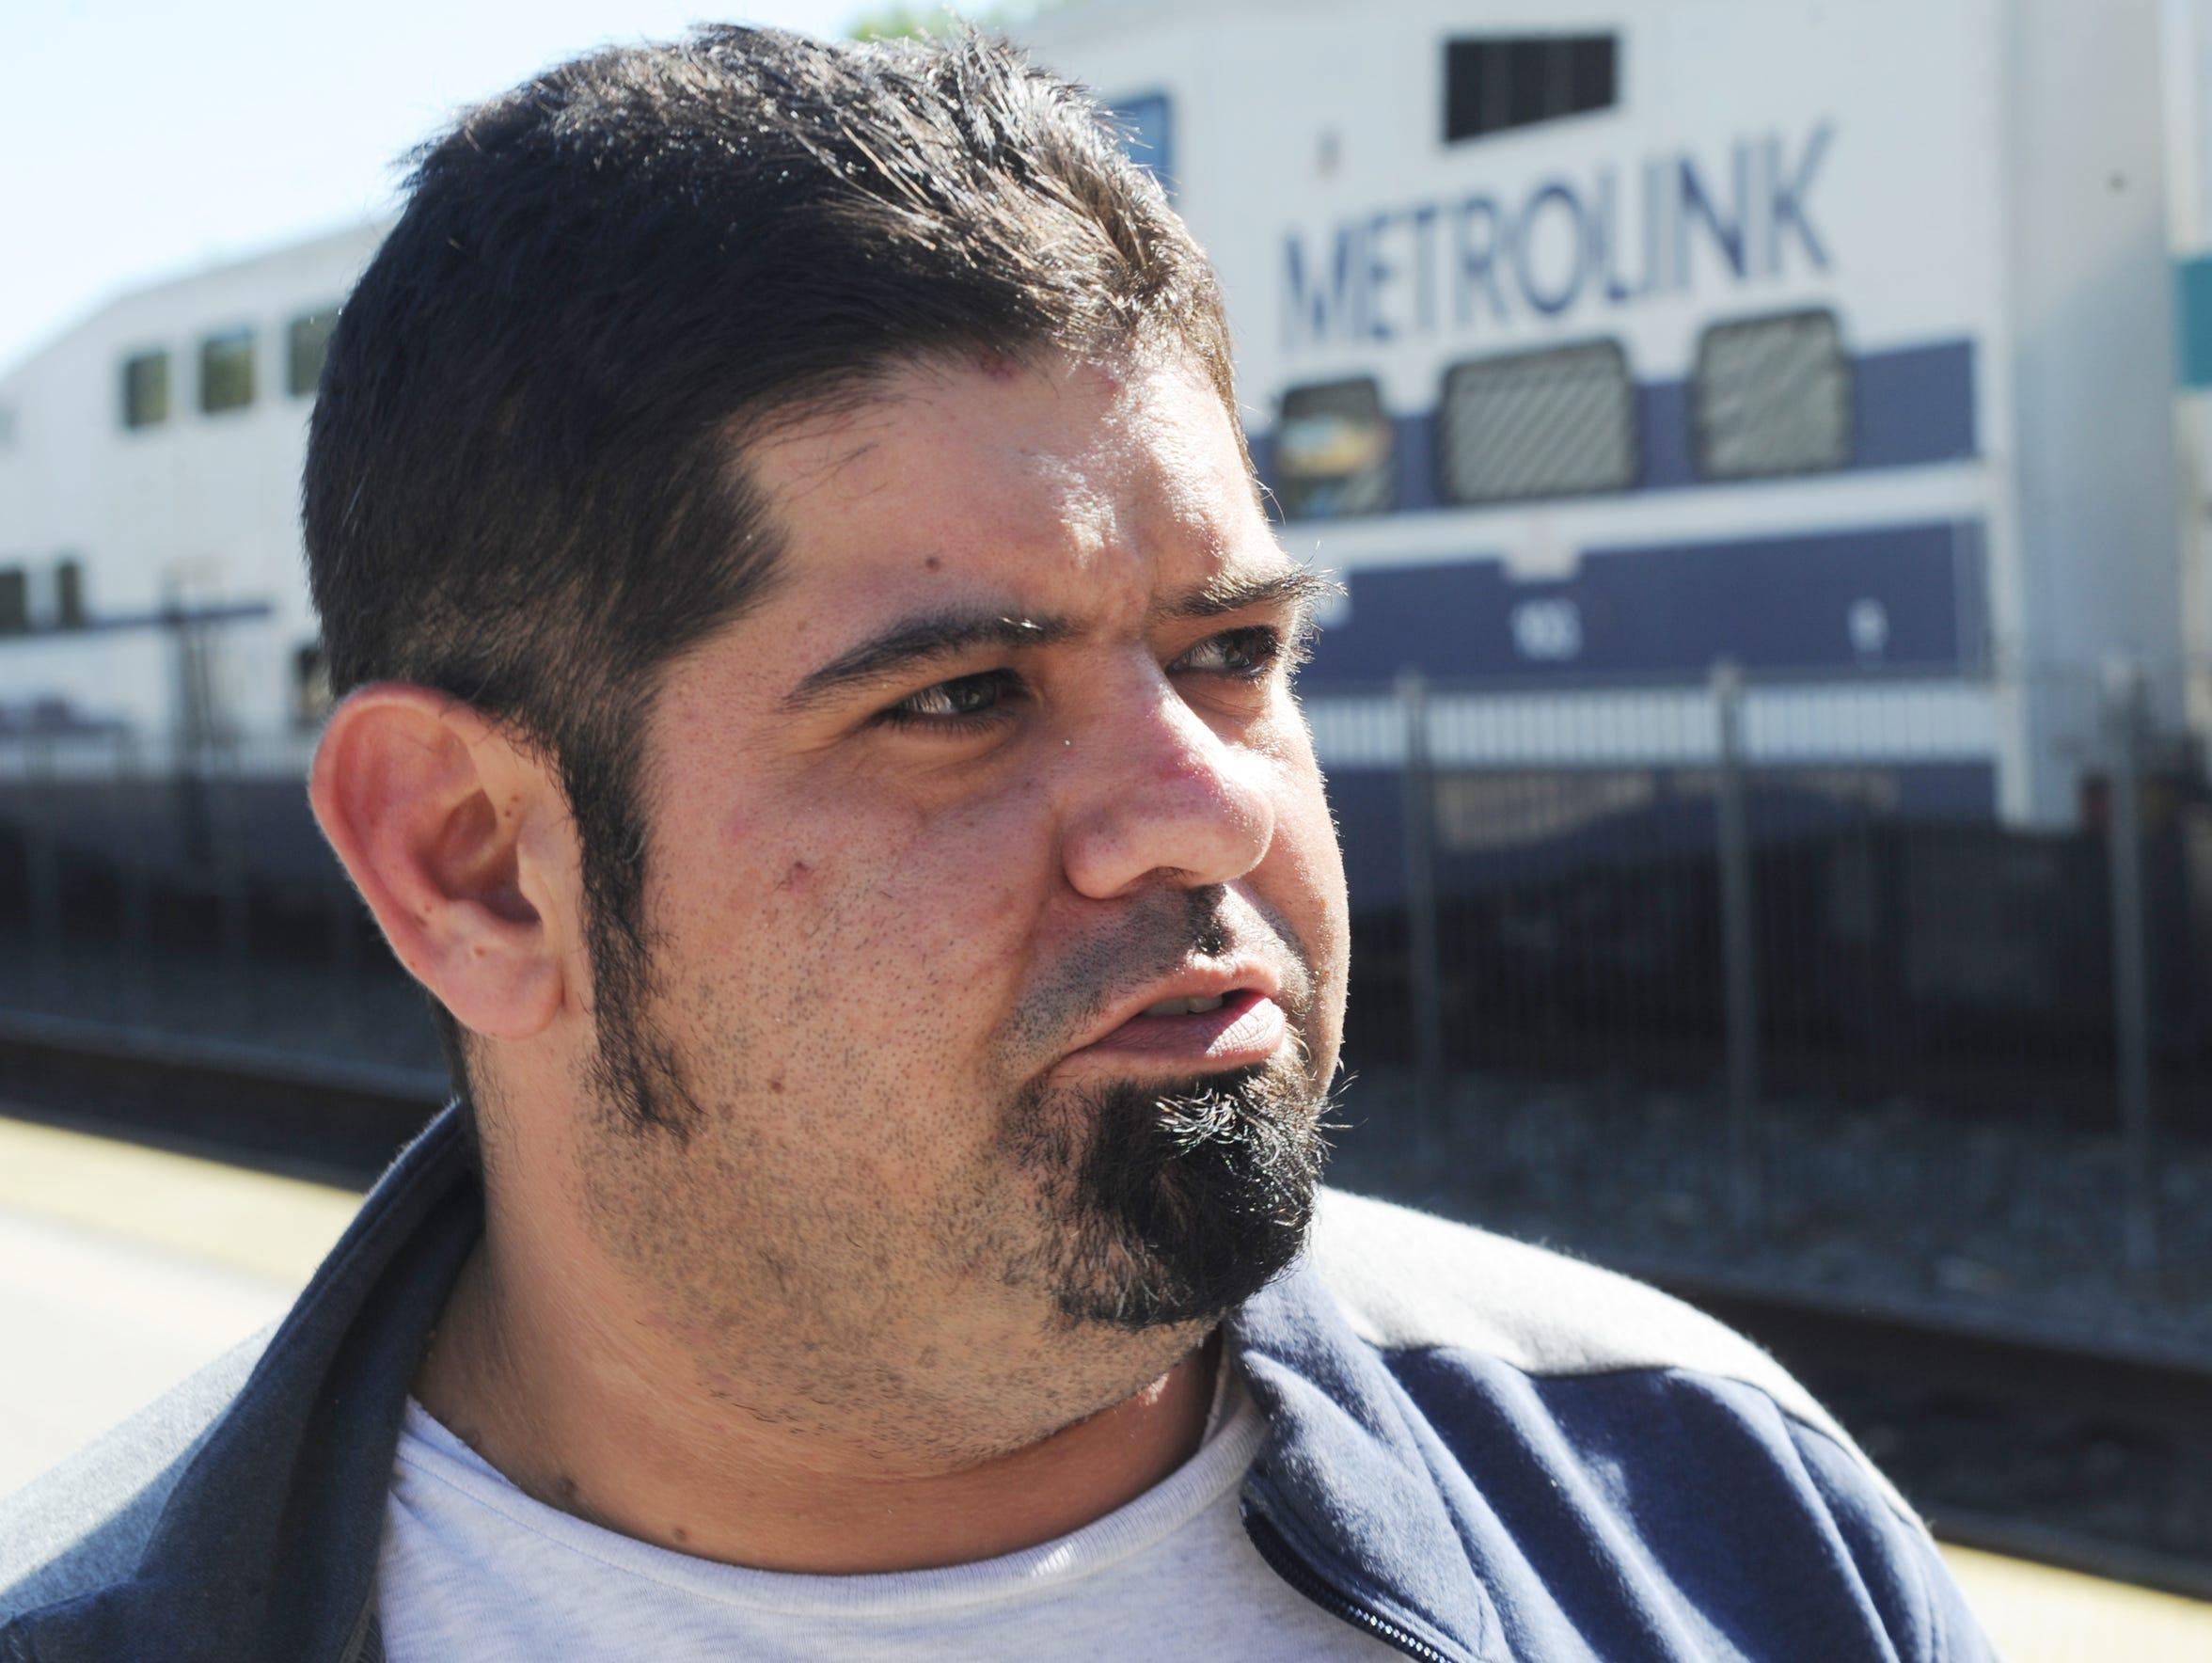 Carlos Romero, of Moorpark, waits to take a Metrolink